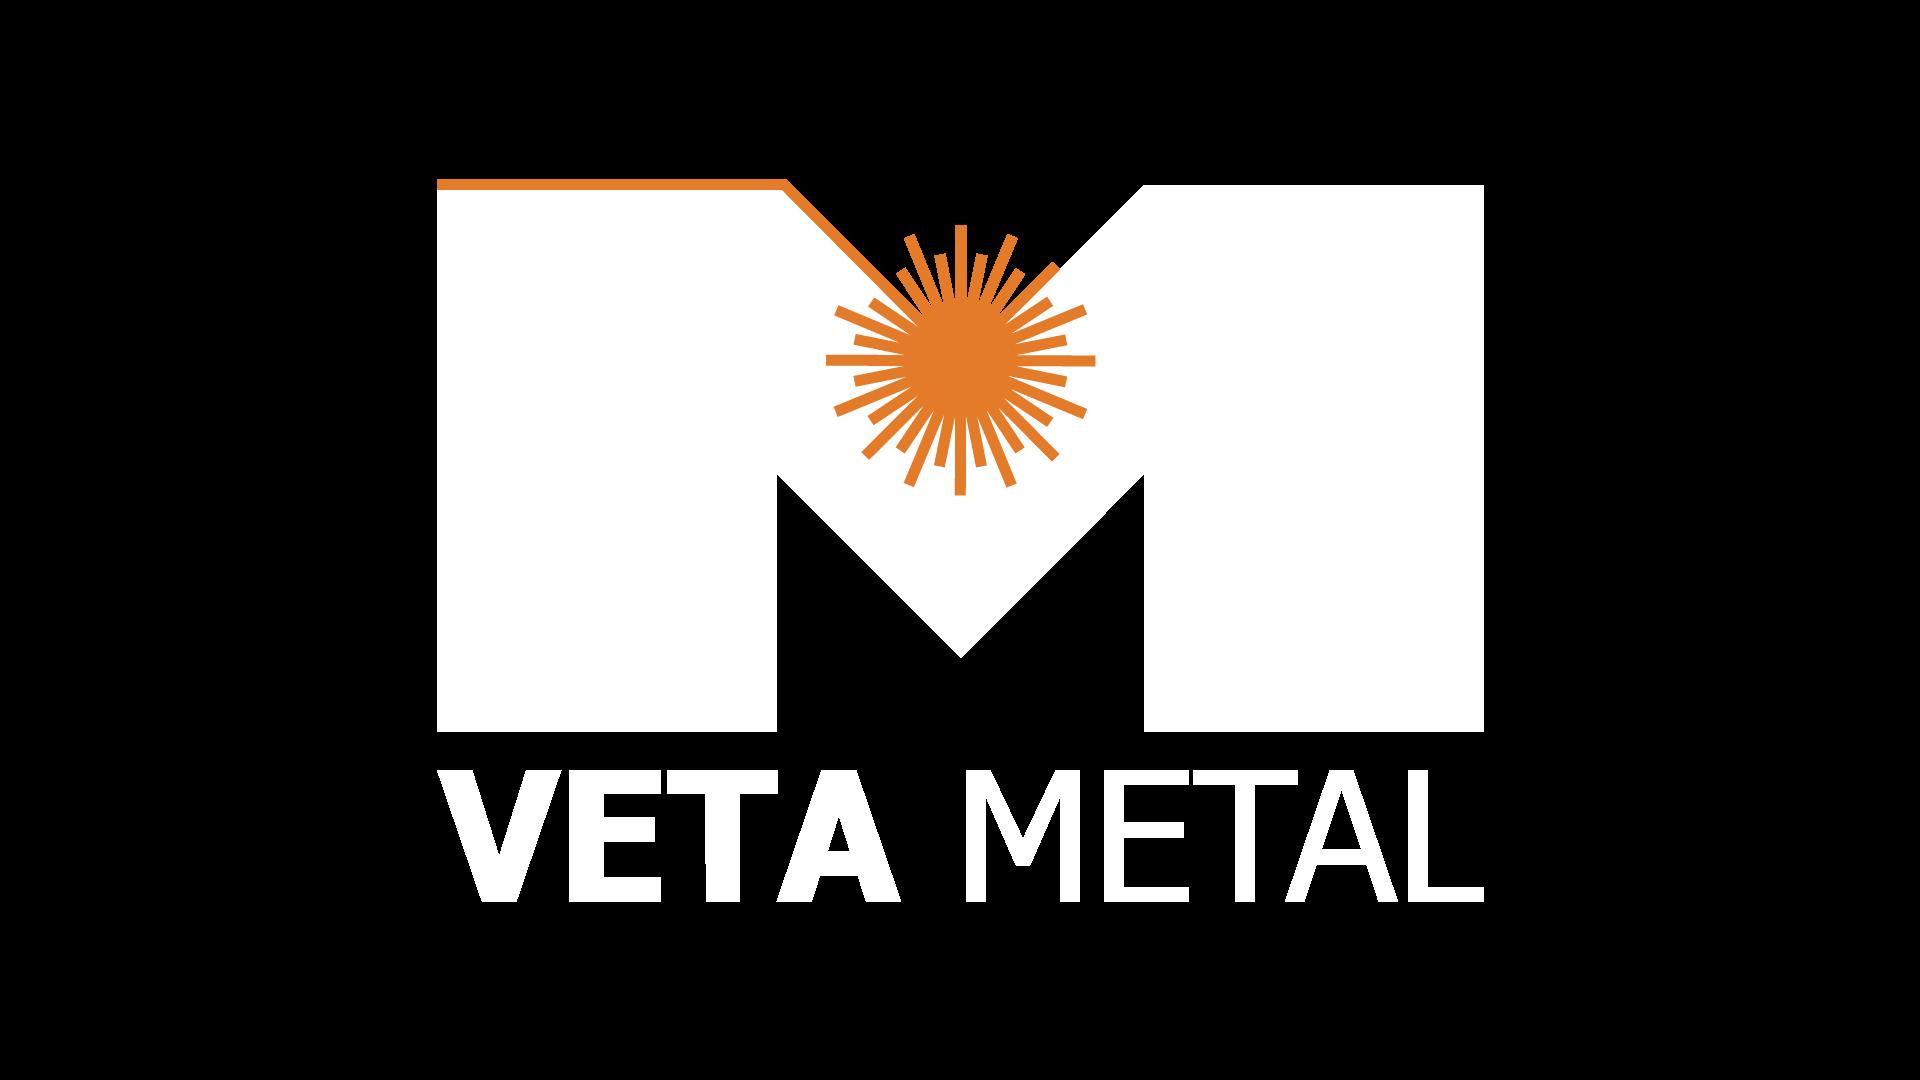 Veta Metal logo